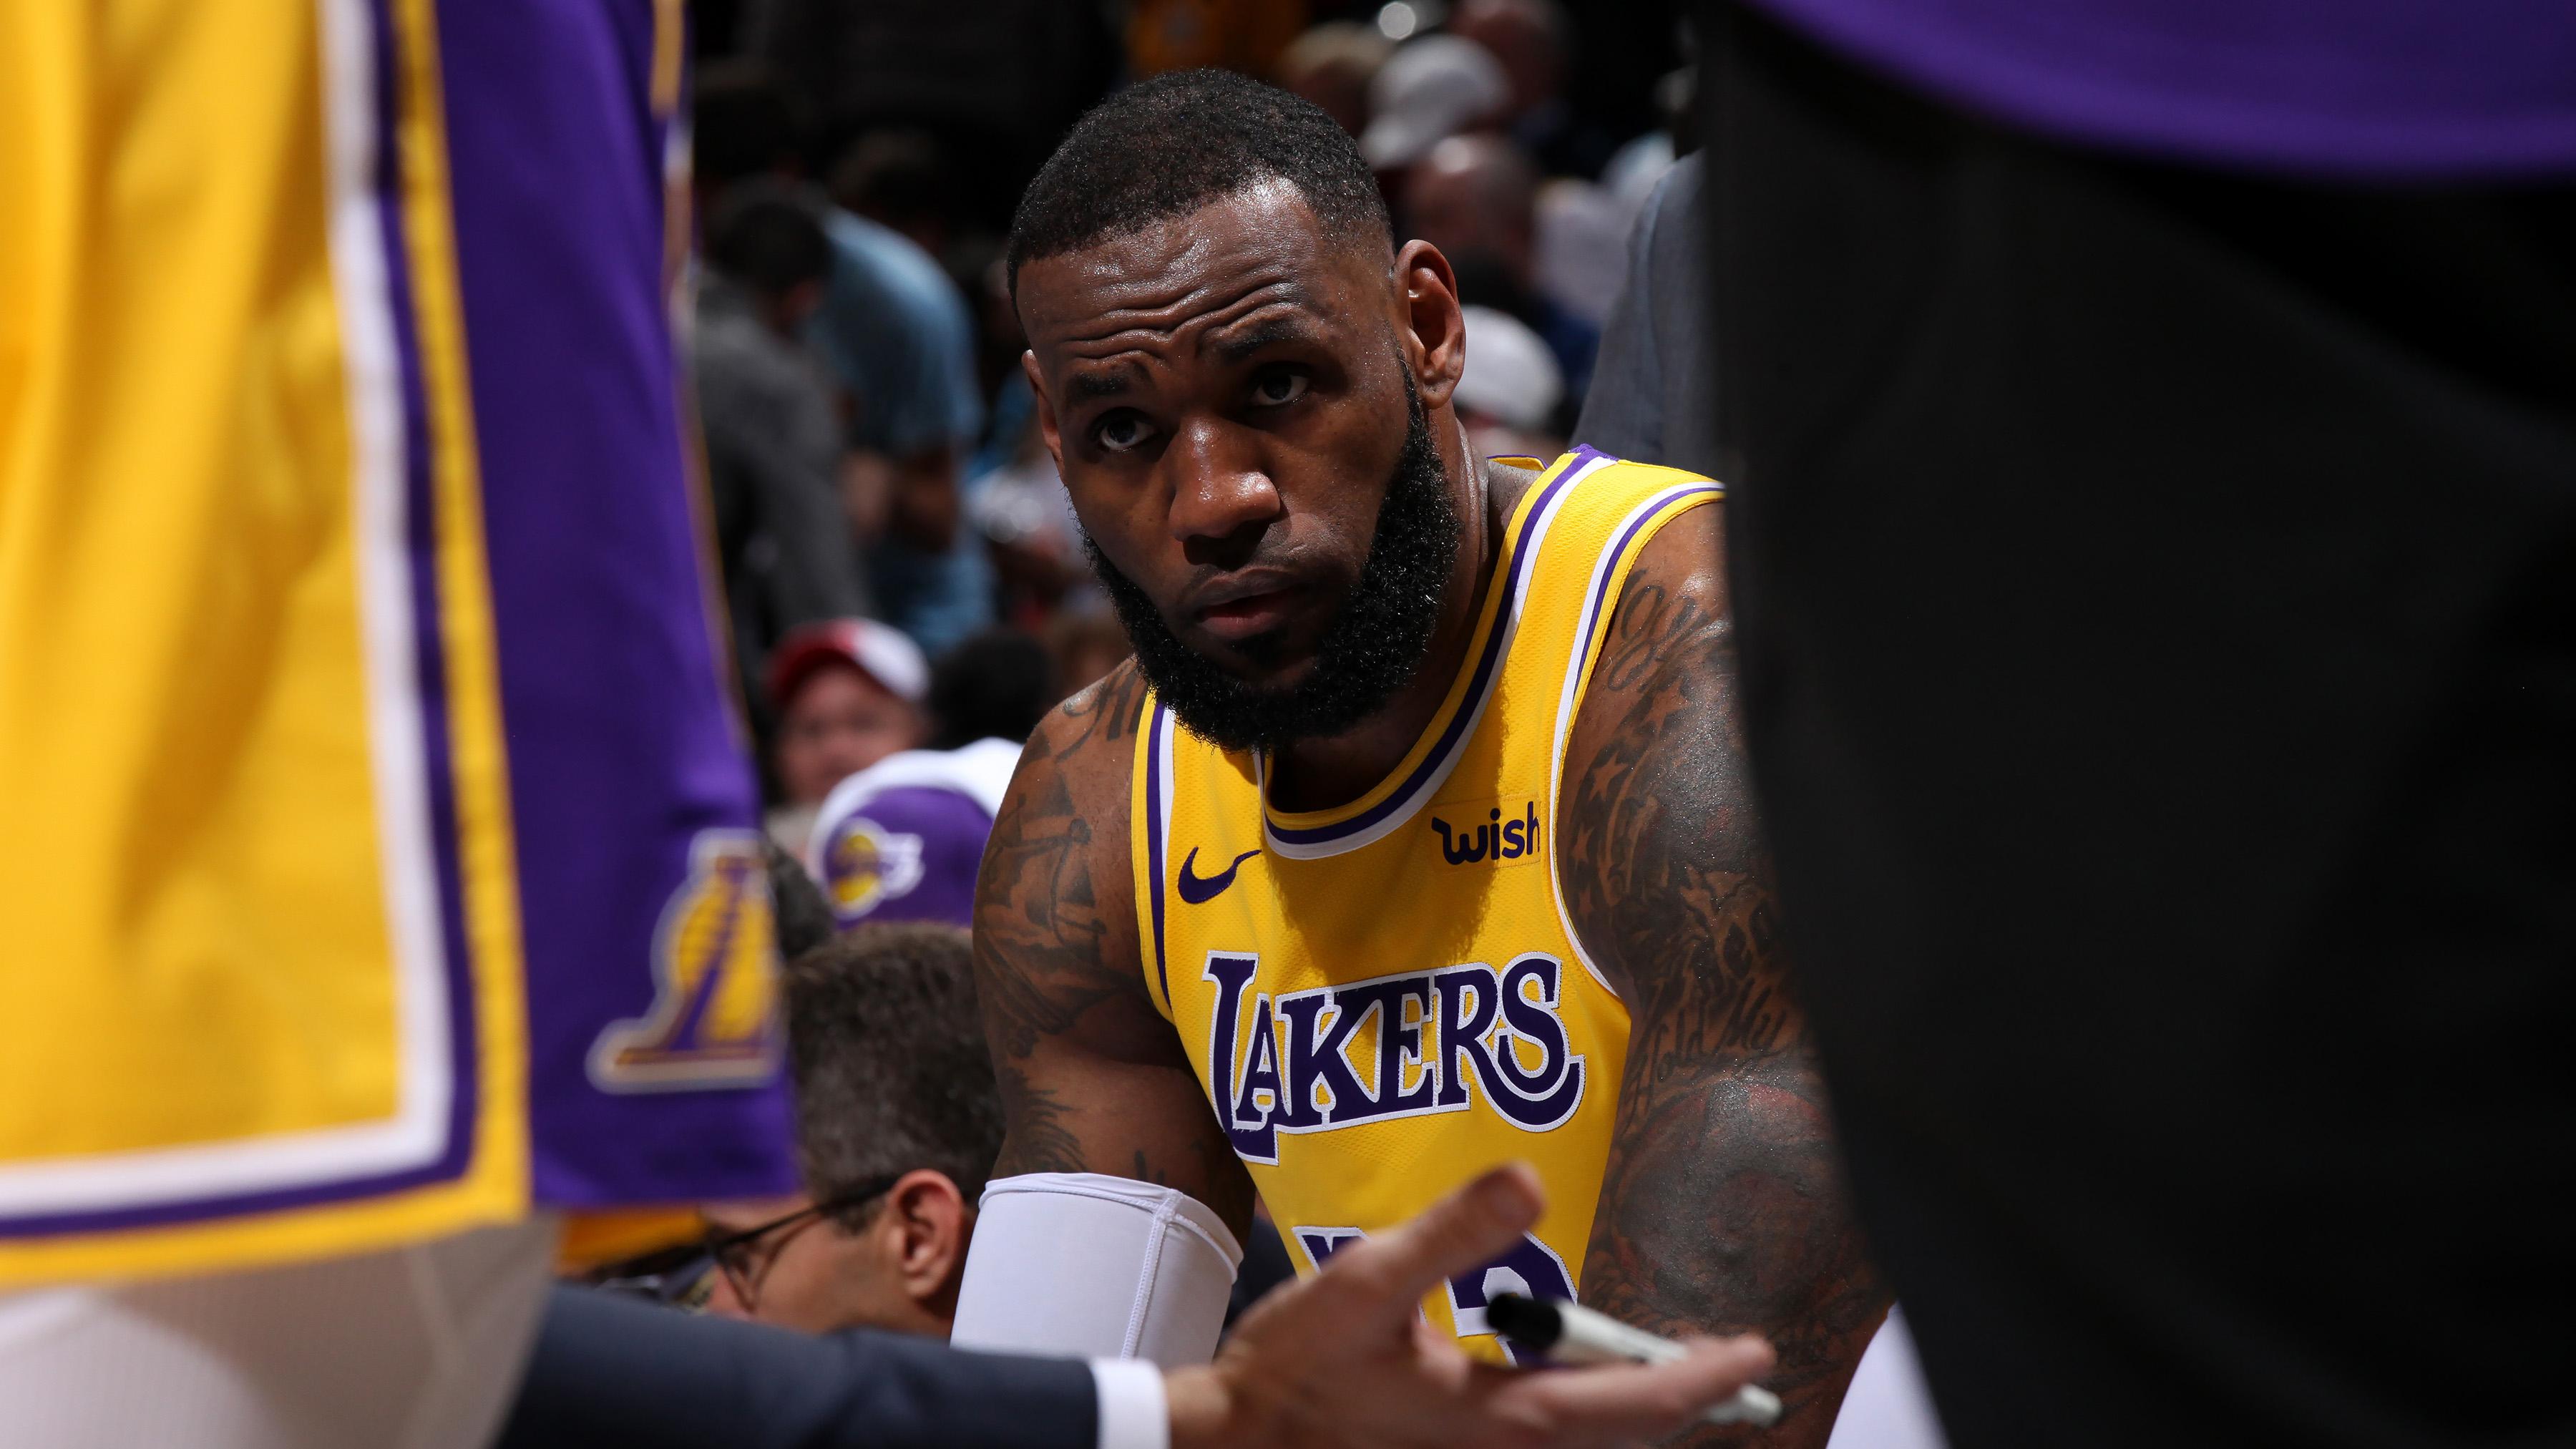 LeBron James: Hawks fans chant 'Kobe's better' at Lakers F (video)